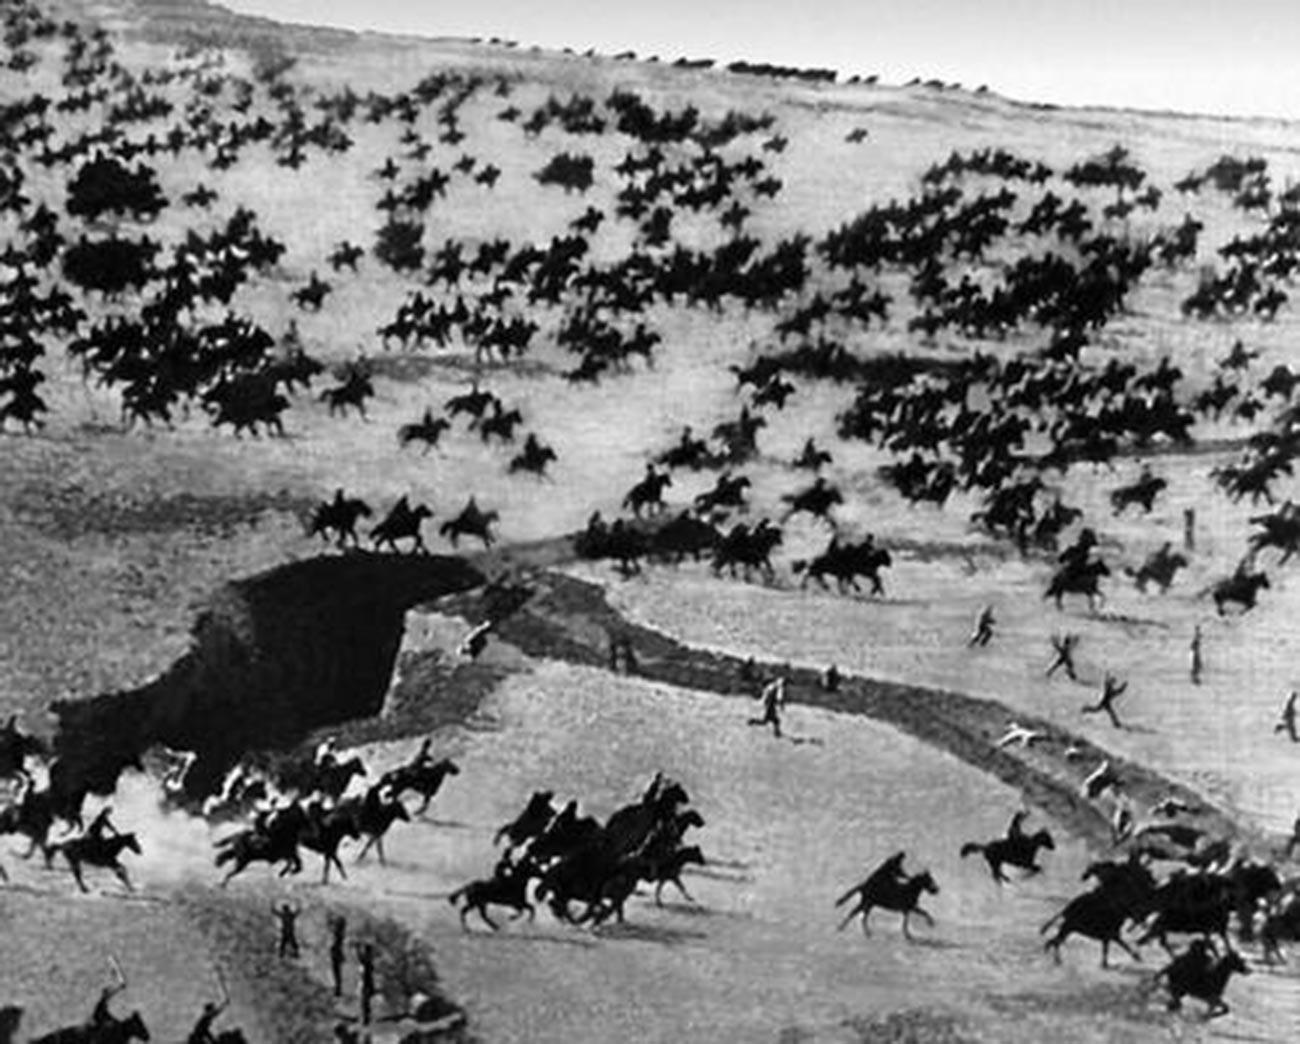 Rdeča konjenica v napadu, 1919